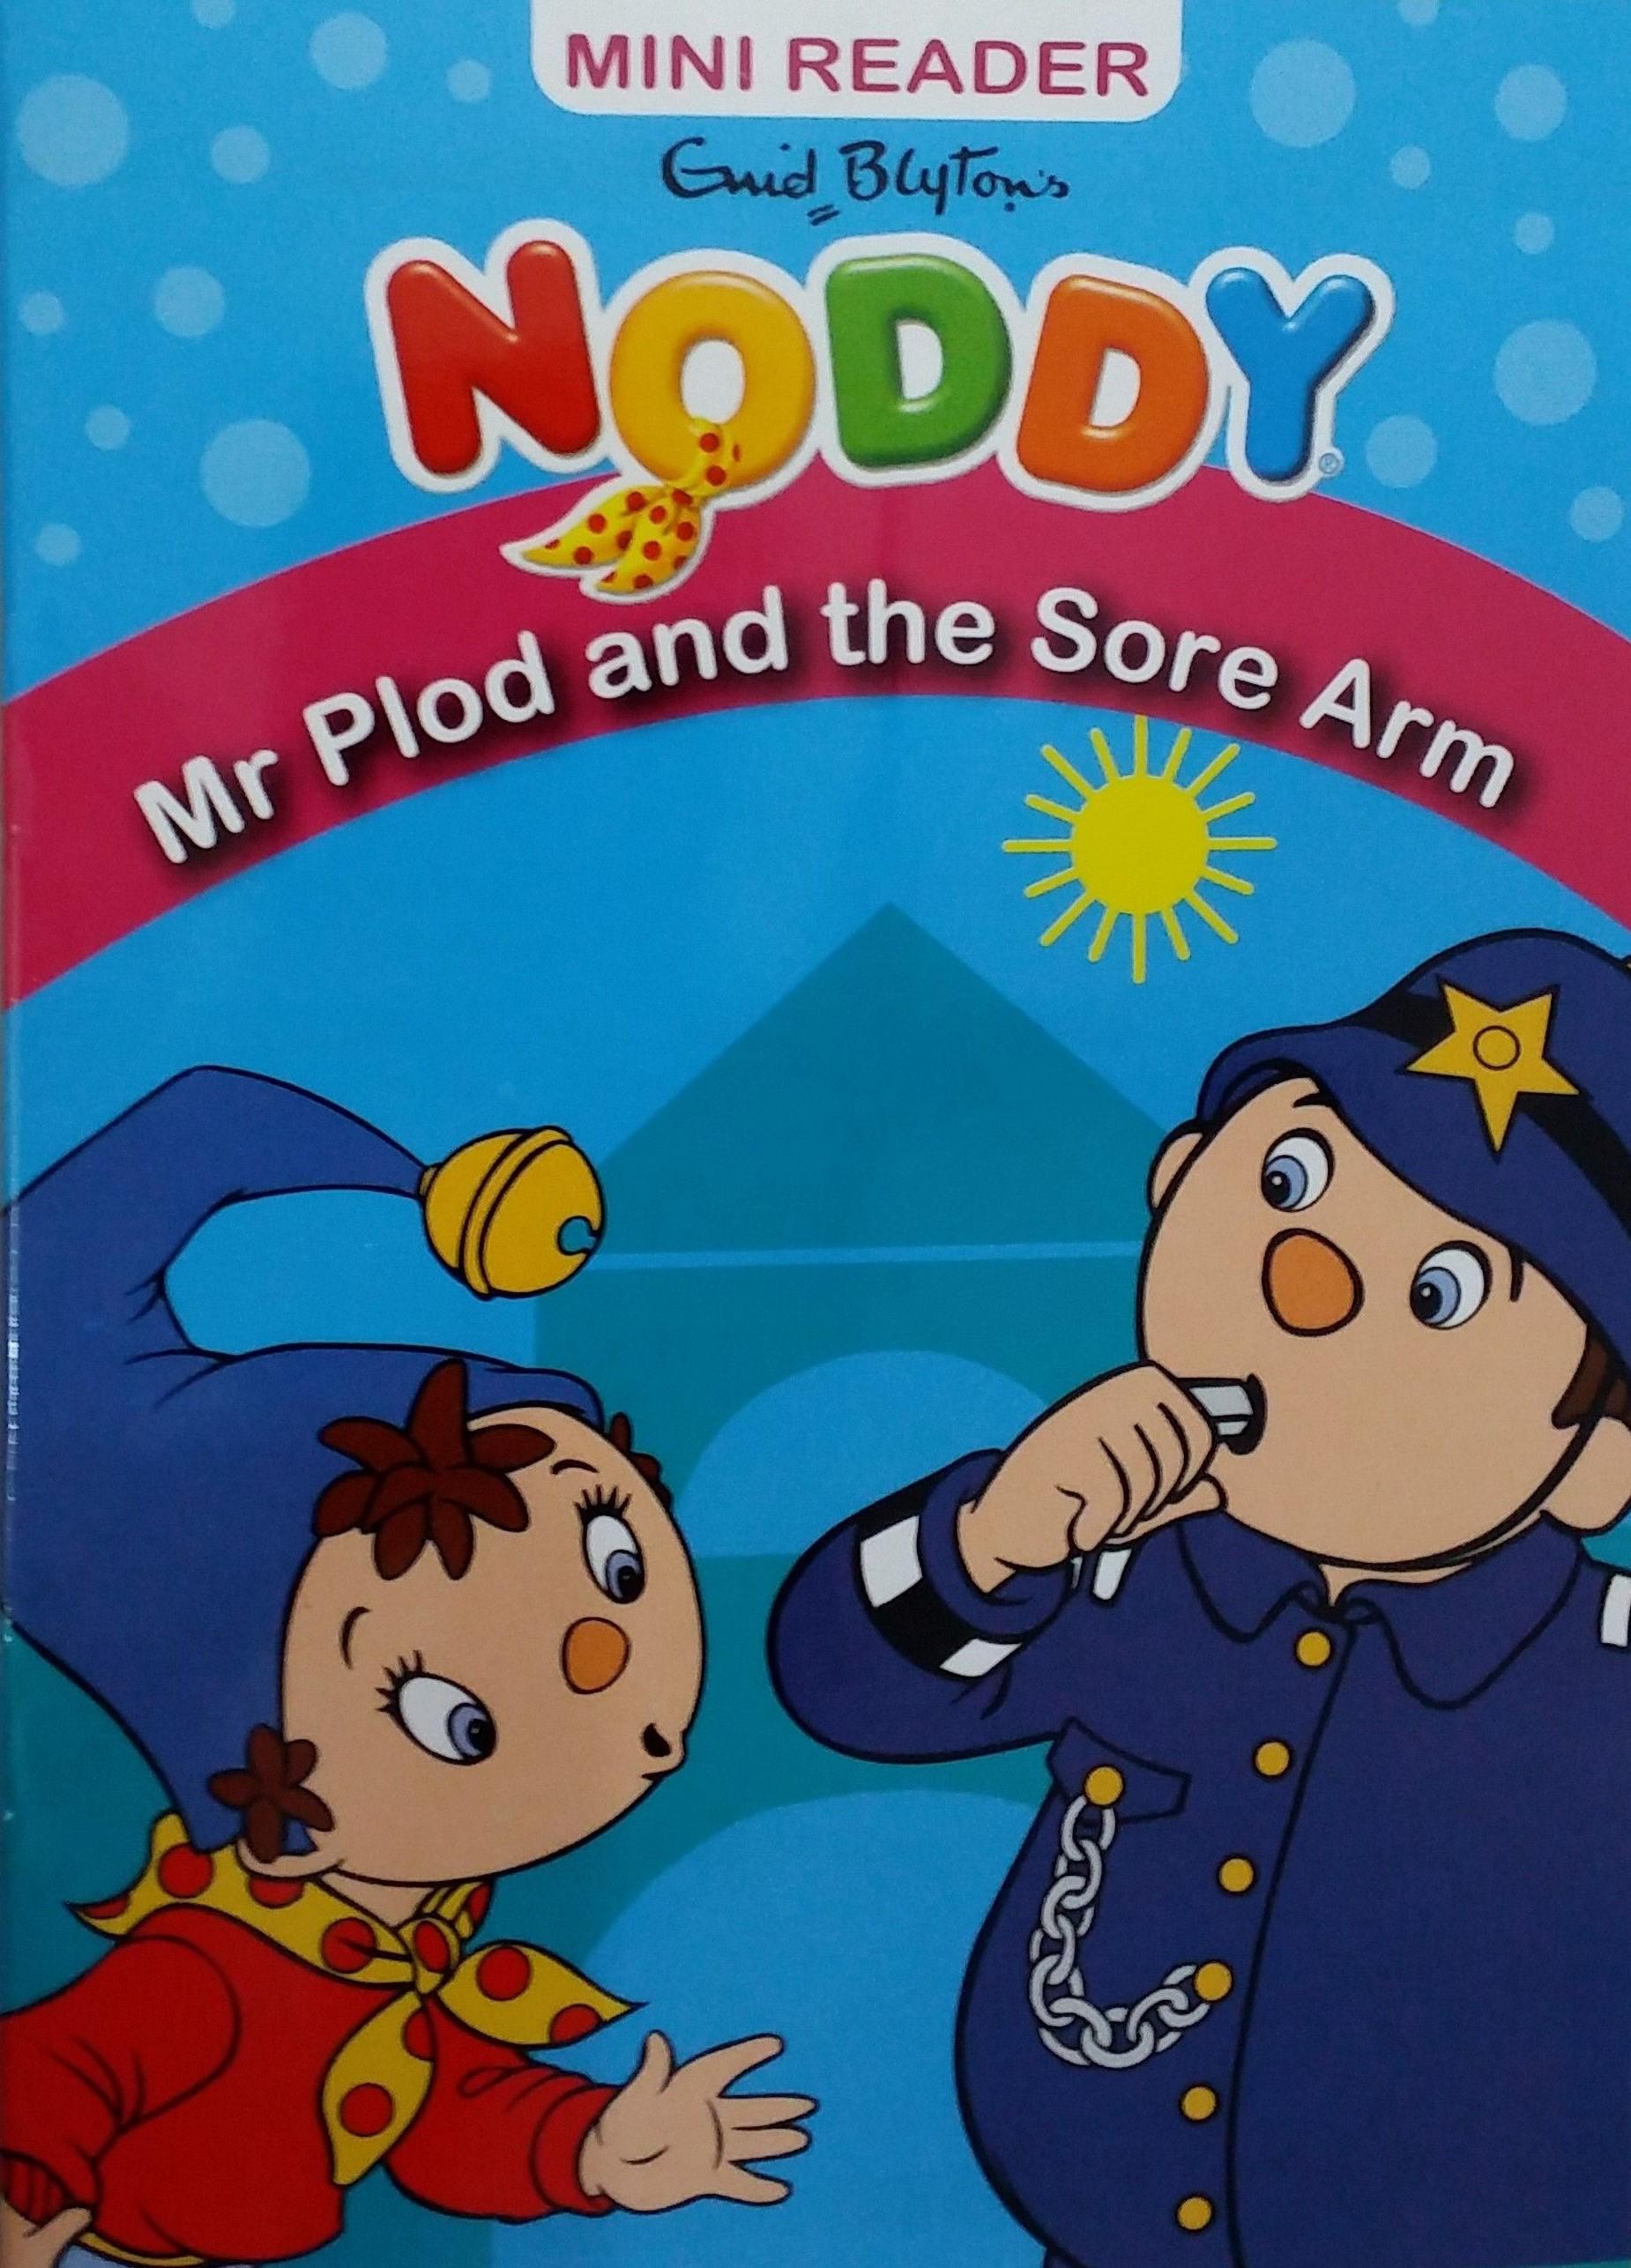 NODDY MINI READER MR PLOD AND THE SORE ARM